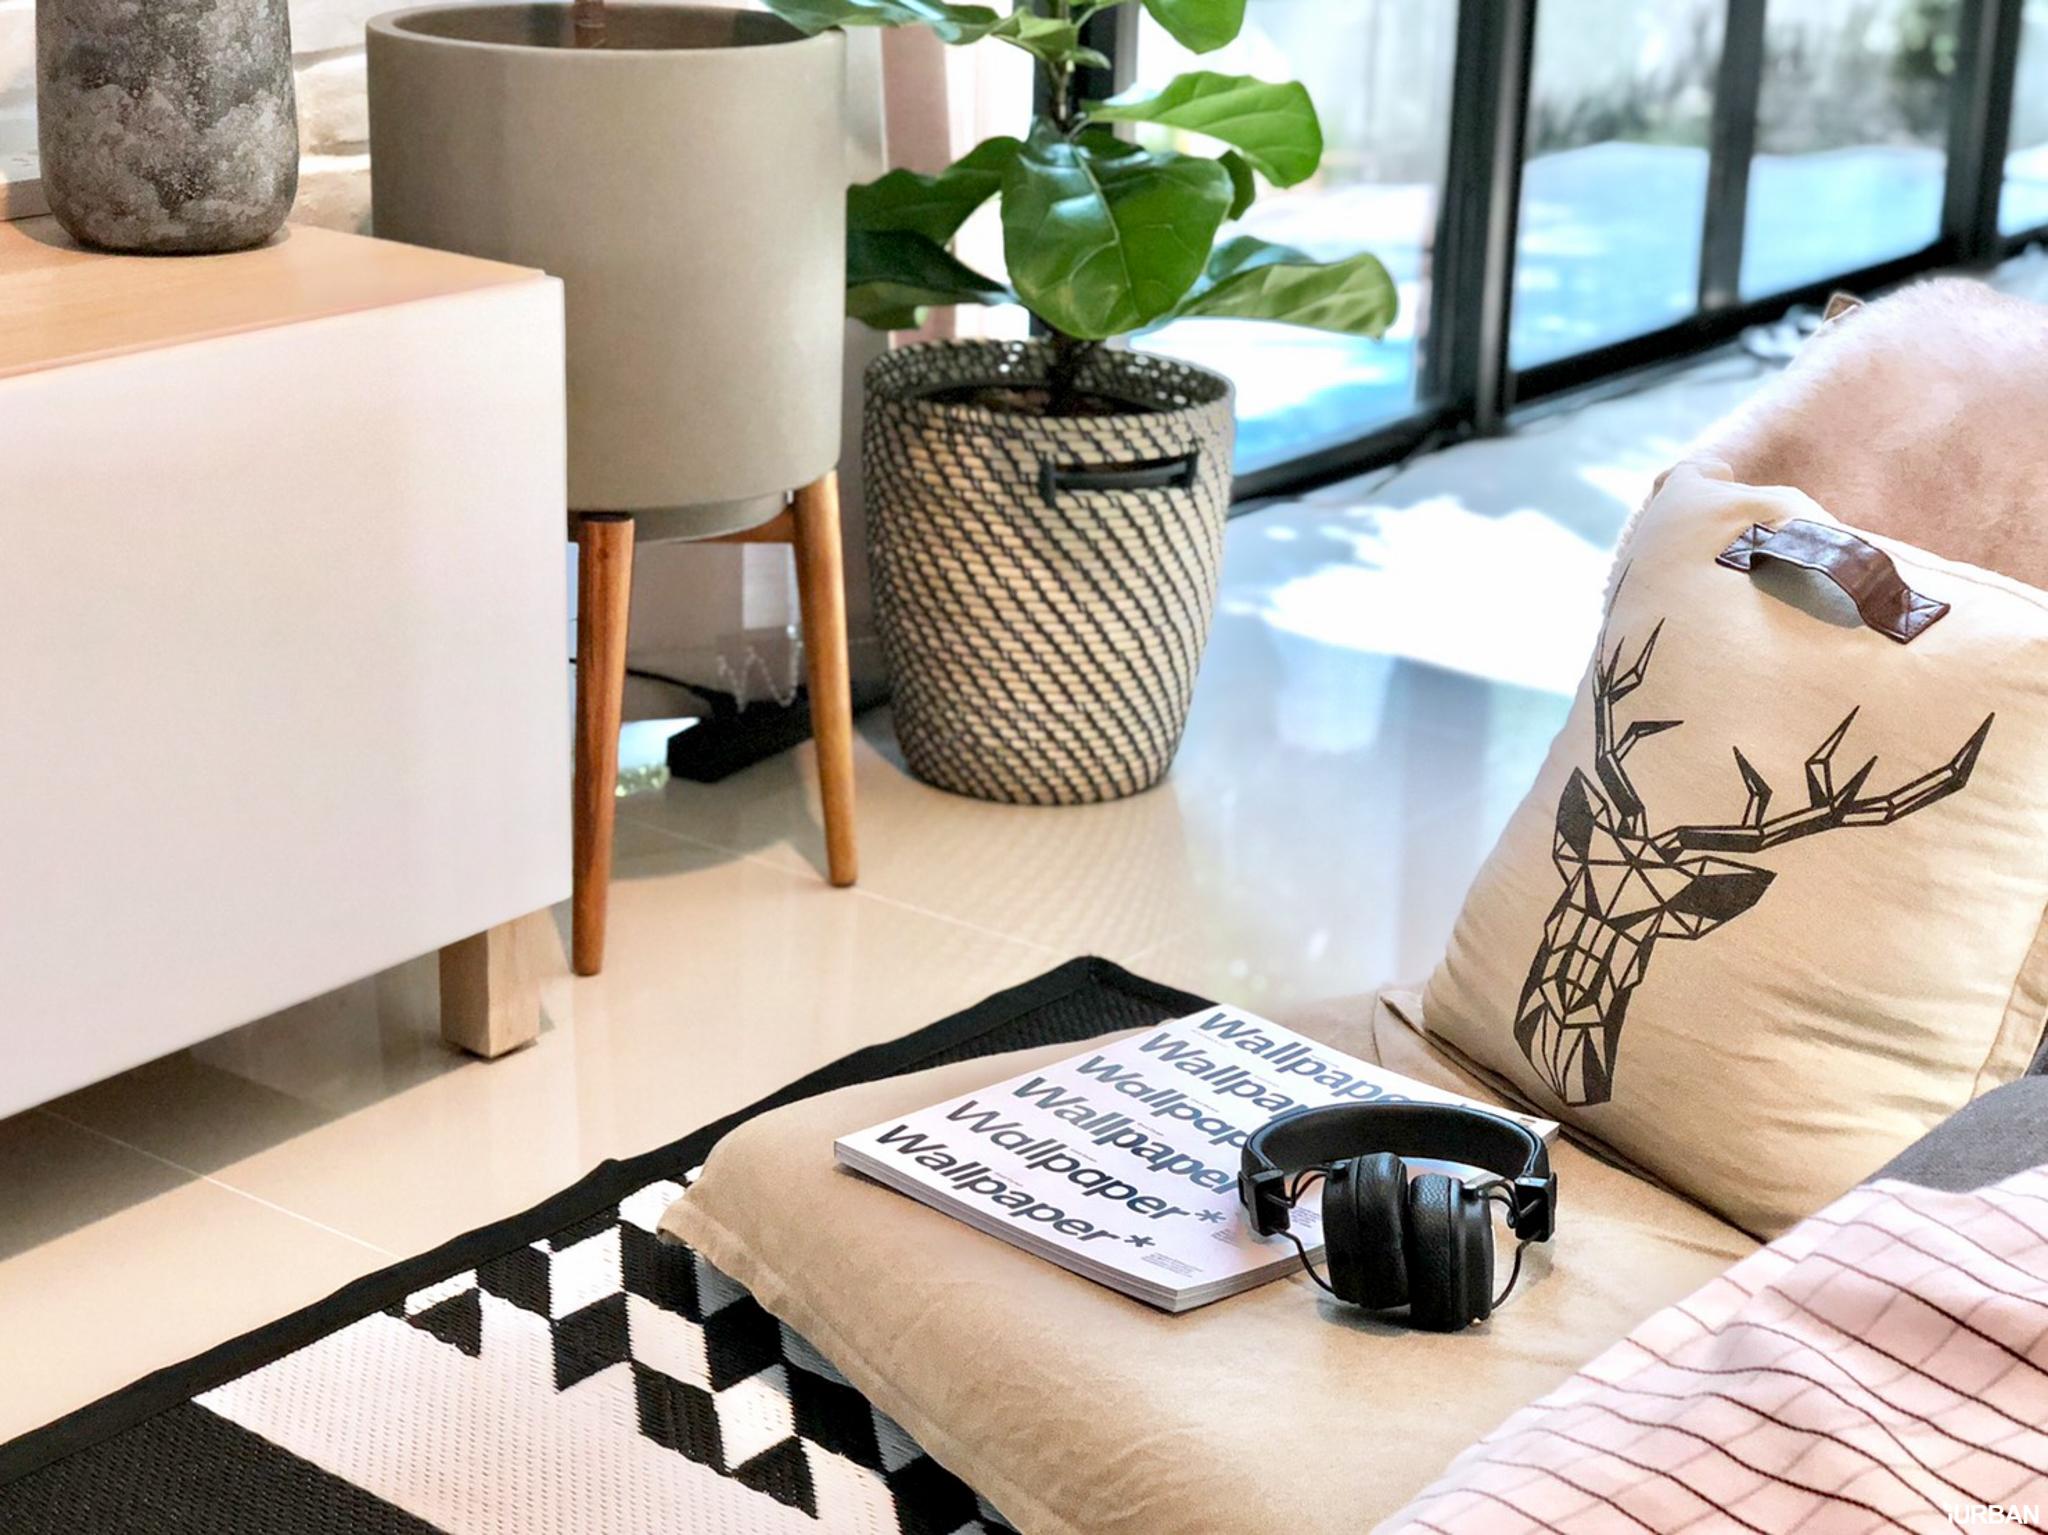 How to เปลี่ยนห้องนั่งเล่นเป็นสไตล์ Nordic ทำเองได้ ง่ายนิดเดียว! 47 - Nordic